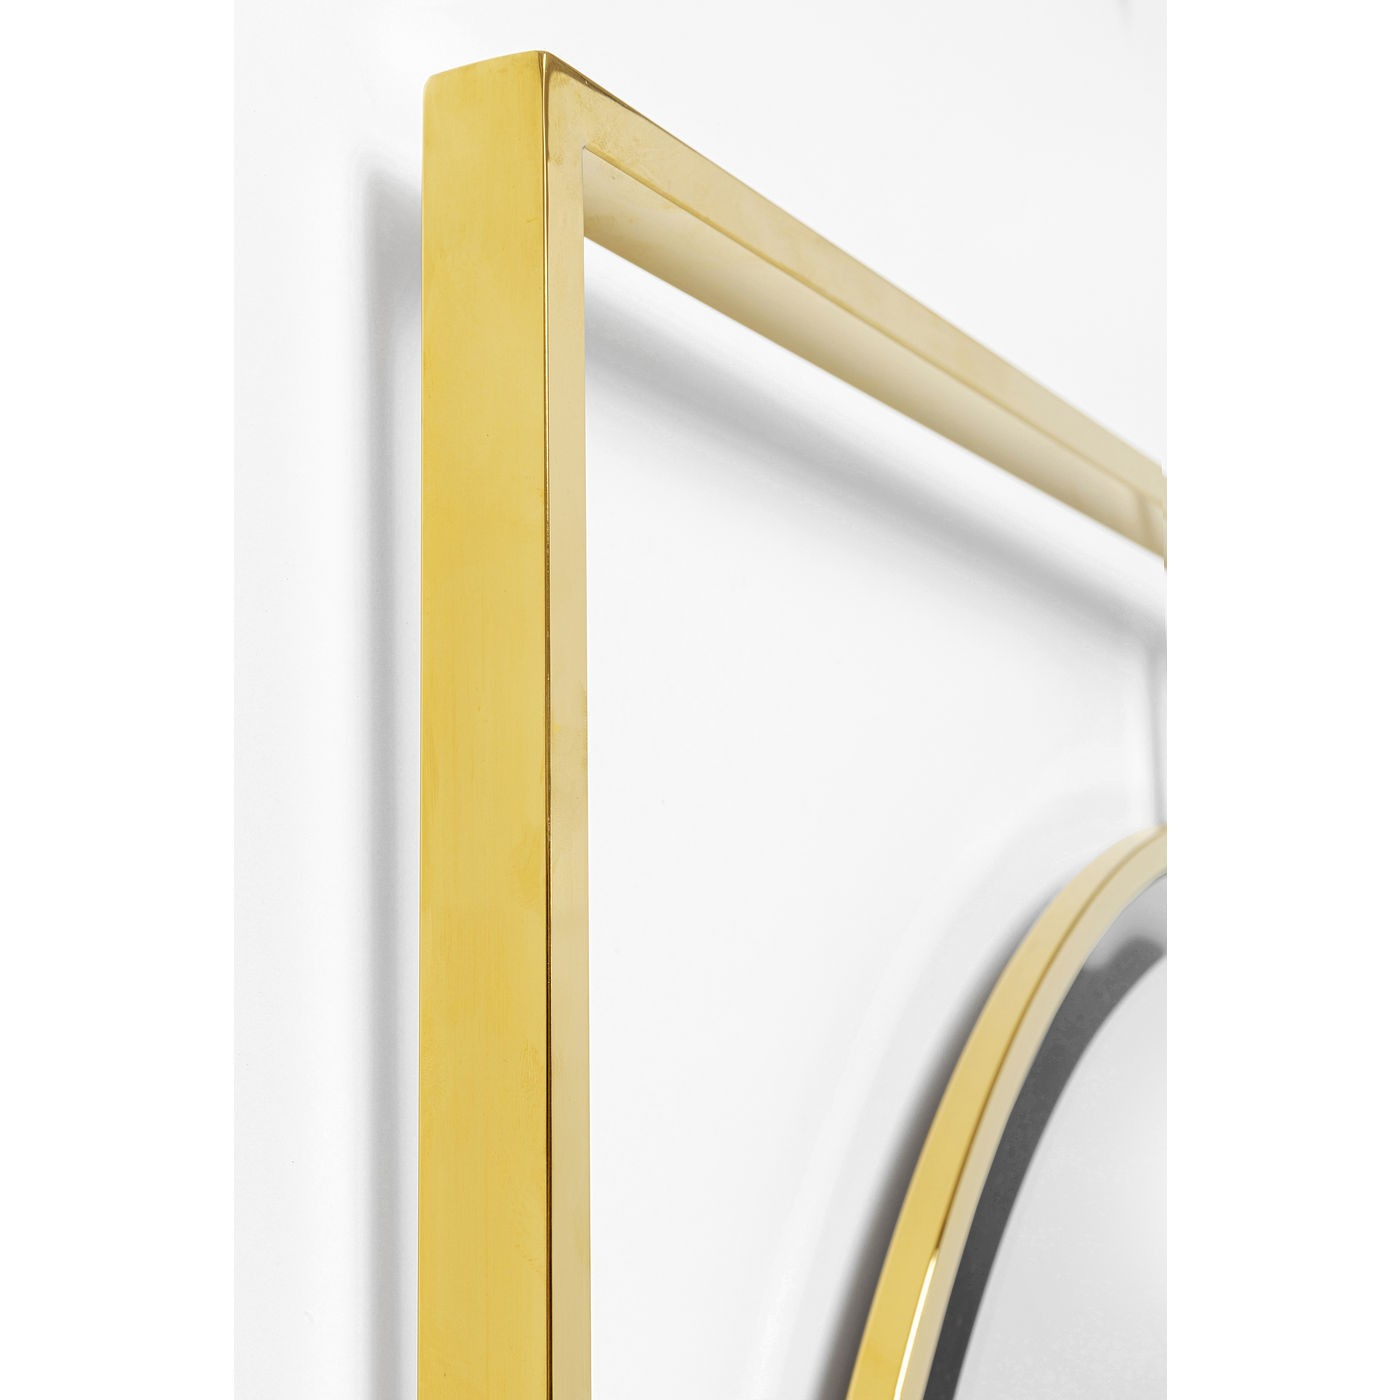 Miroir Stanford rond doré 90cm Kare Design